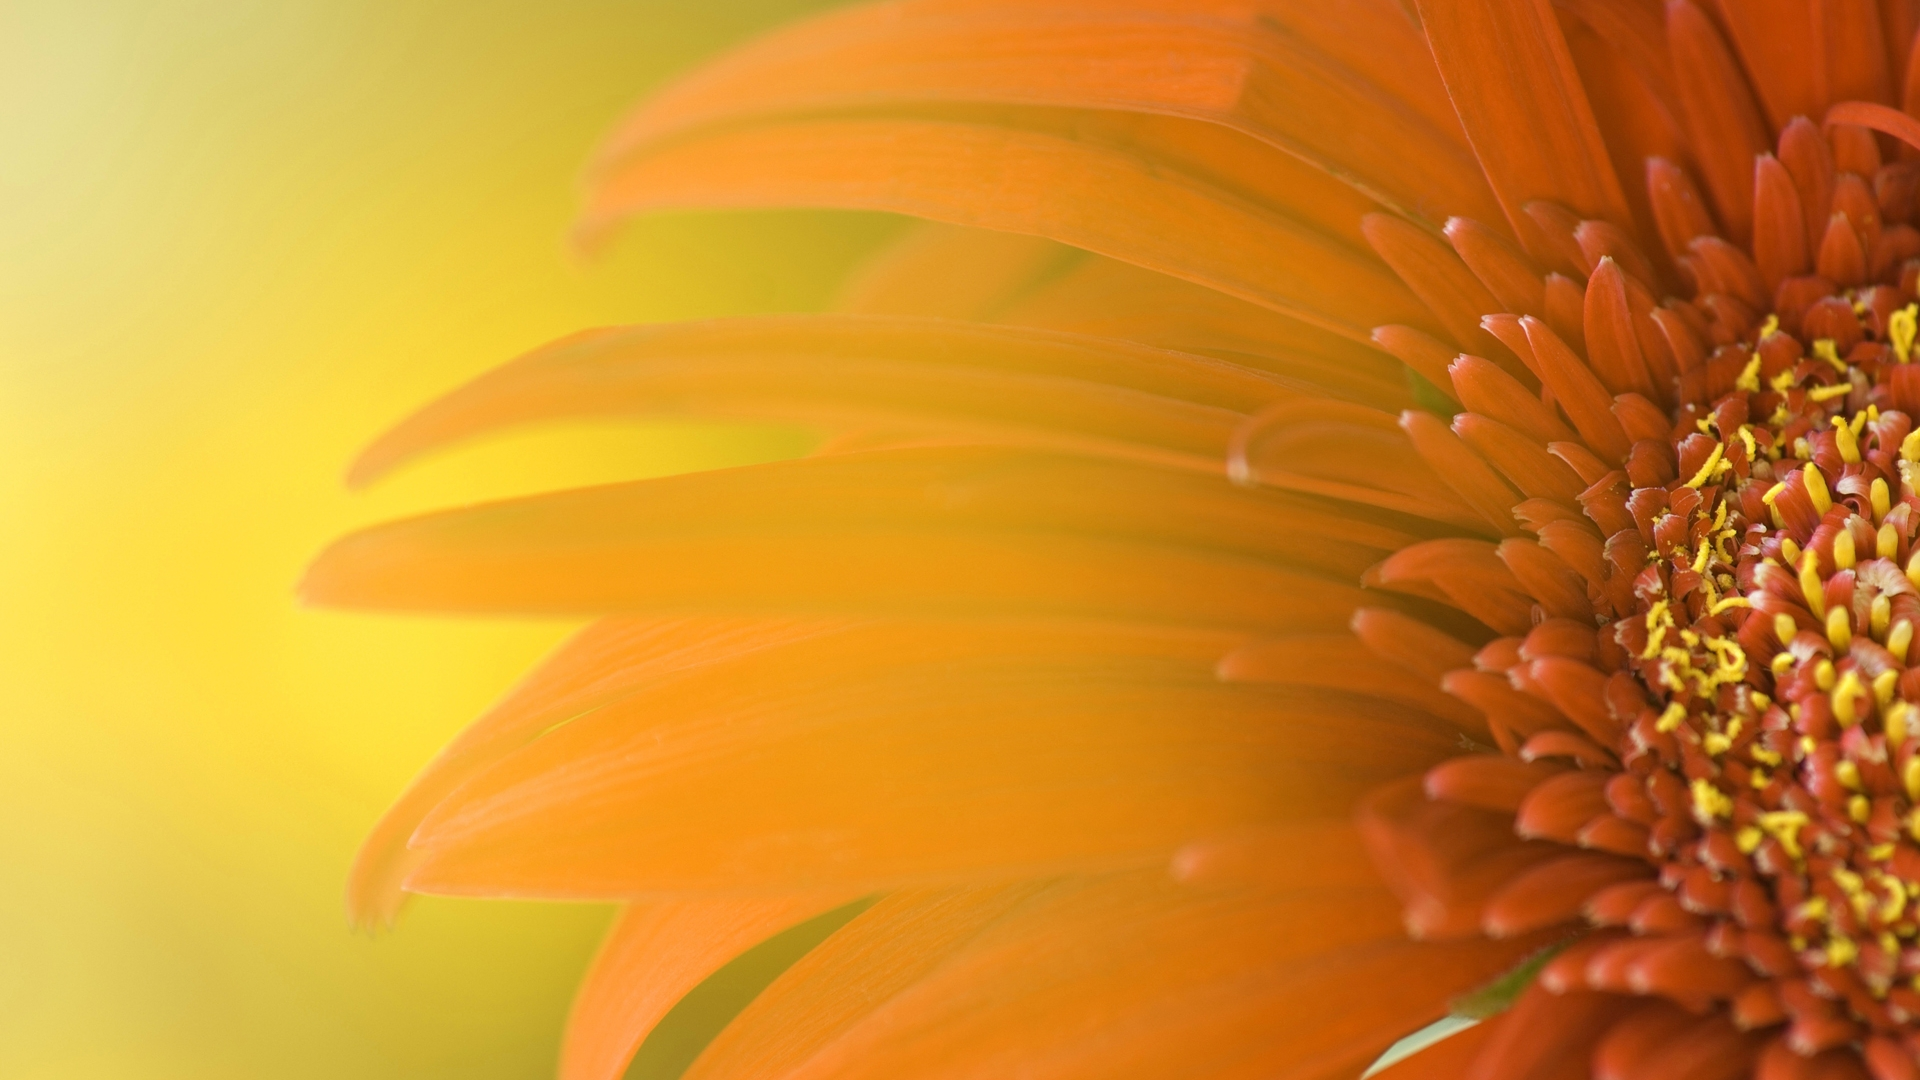 Windows 8 Flower Wallpaper